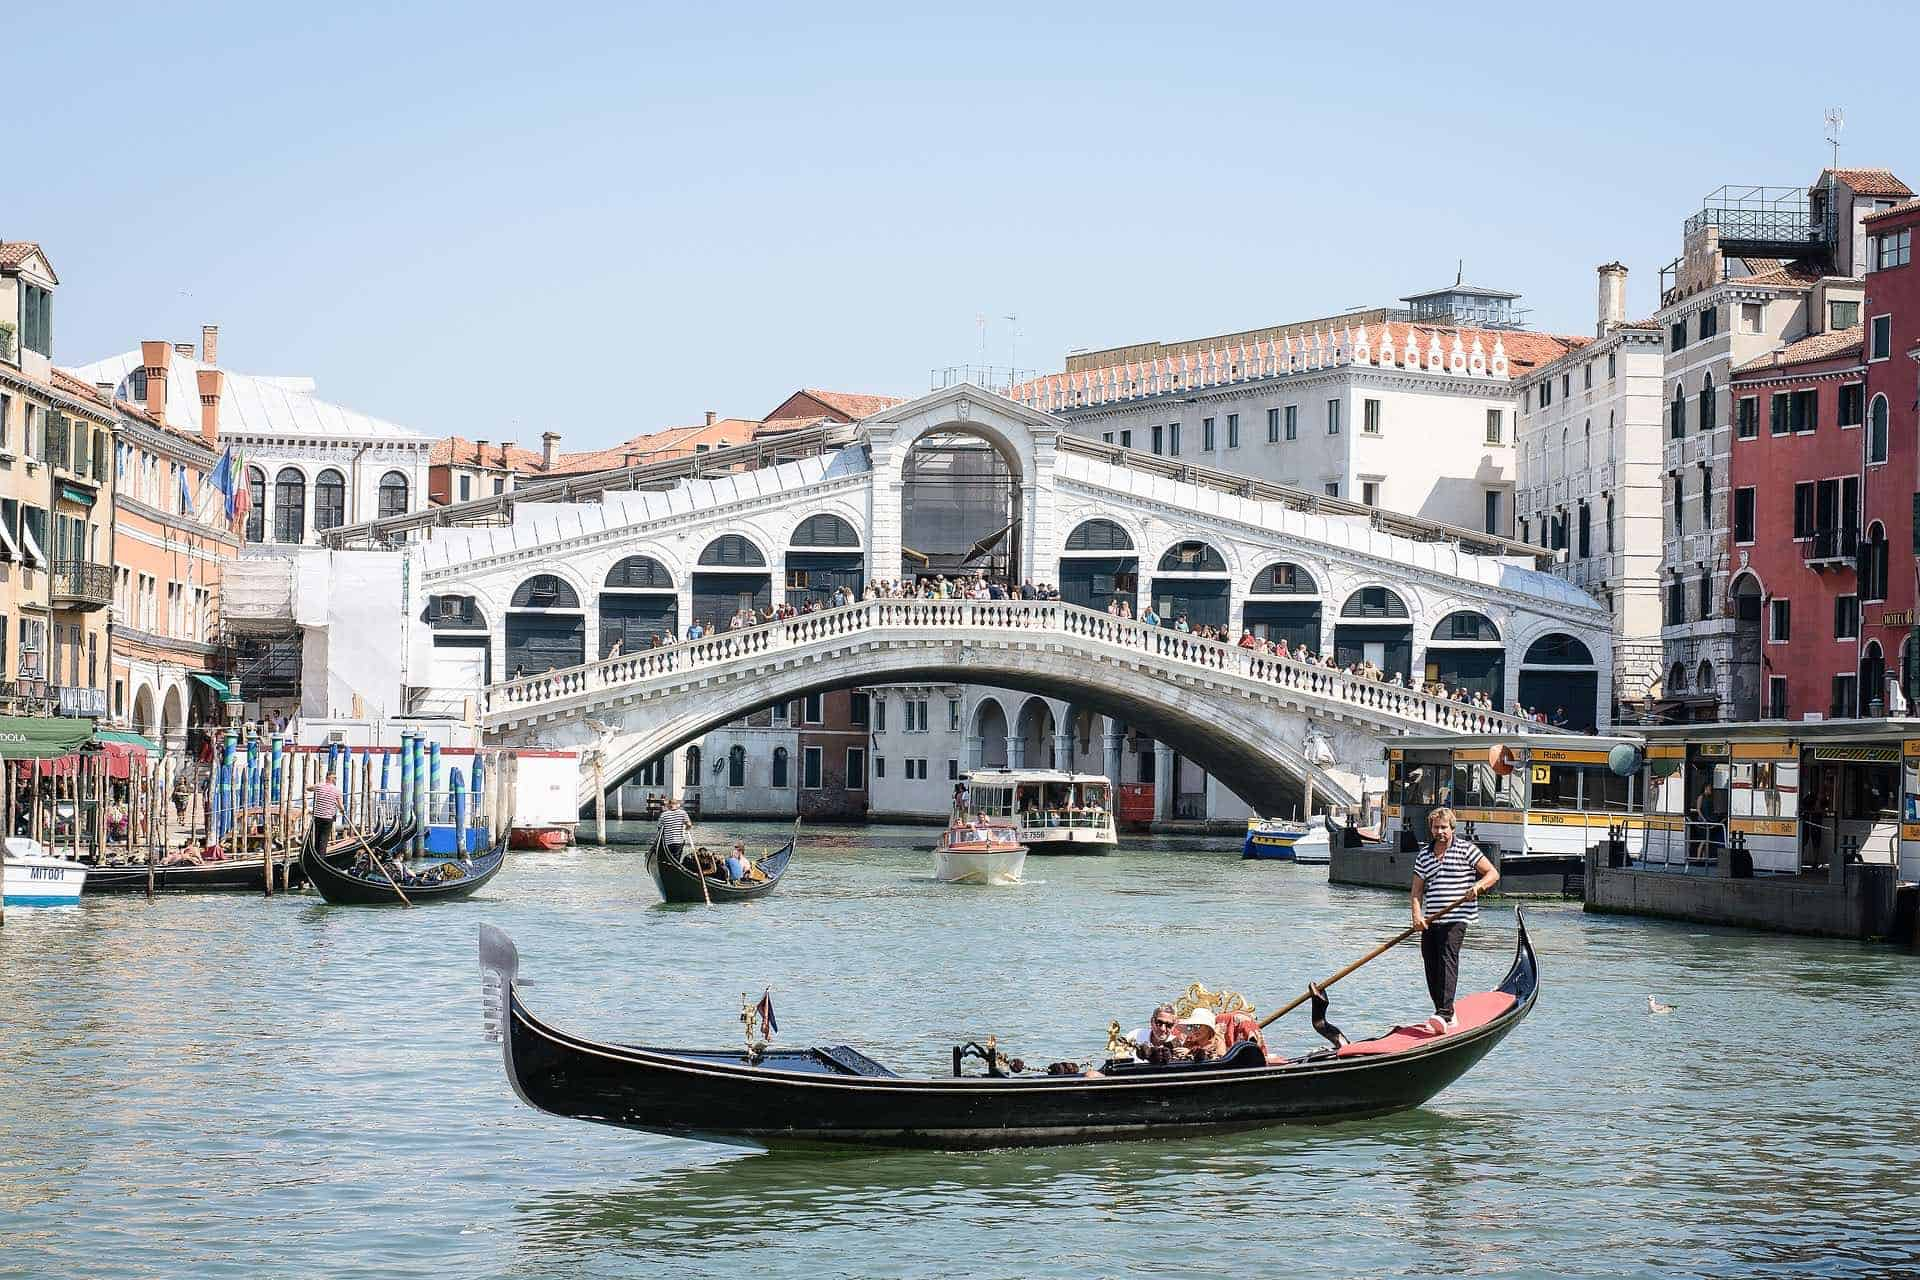 Things to do in Venice - Rialto Bridge